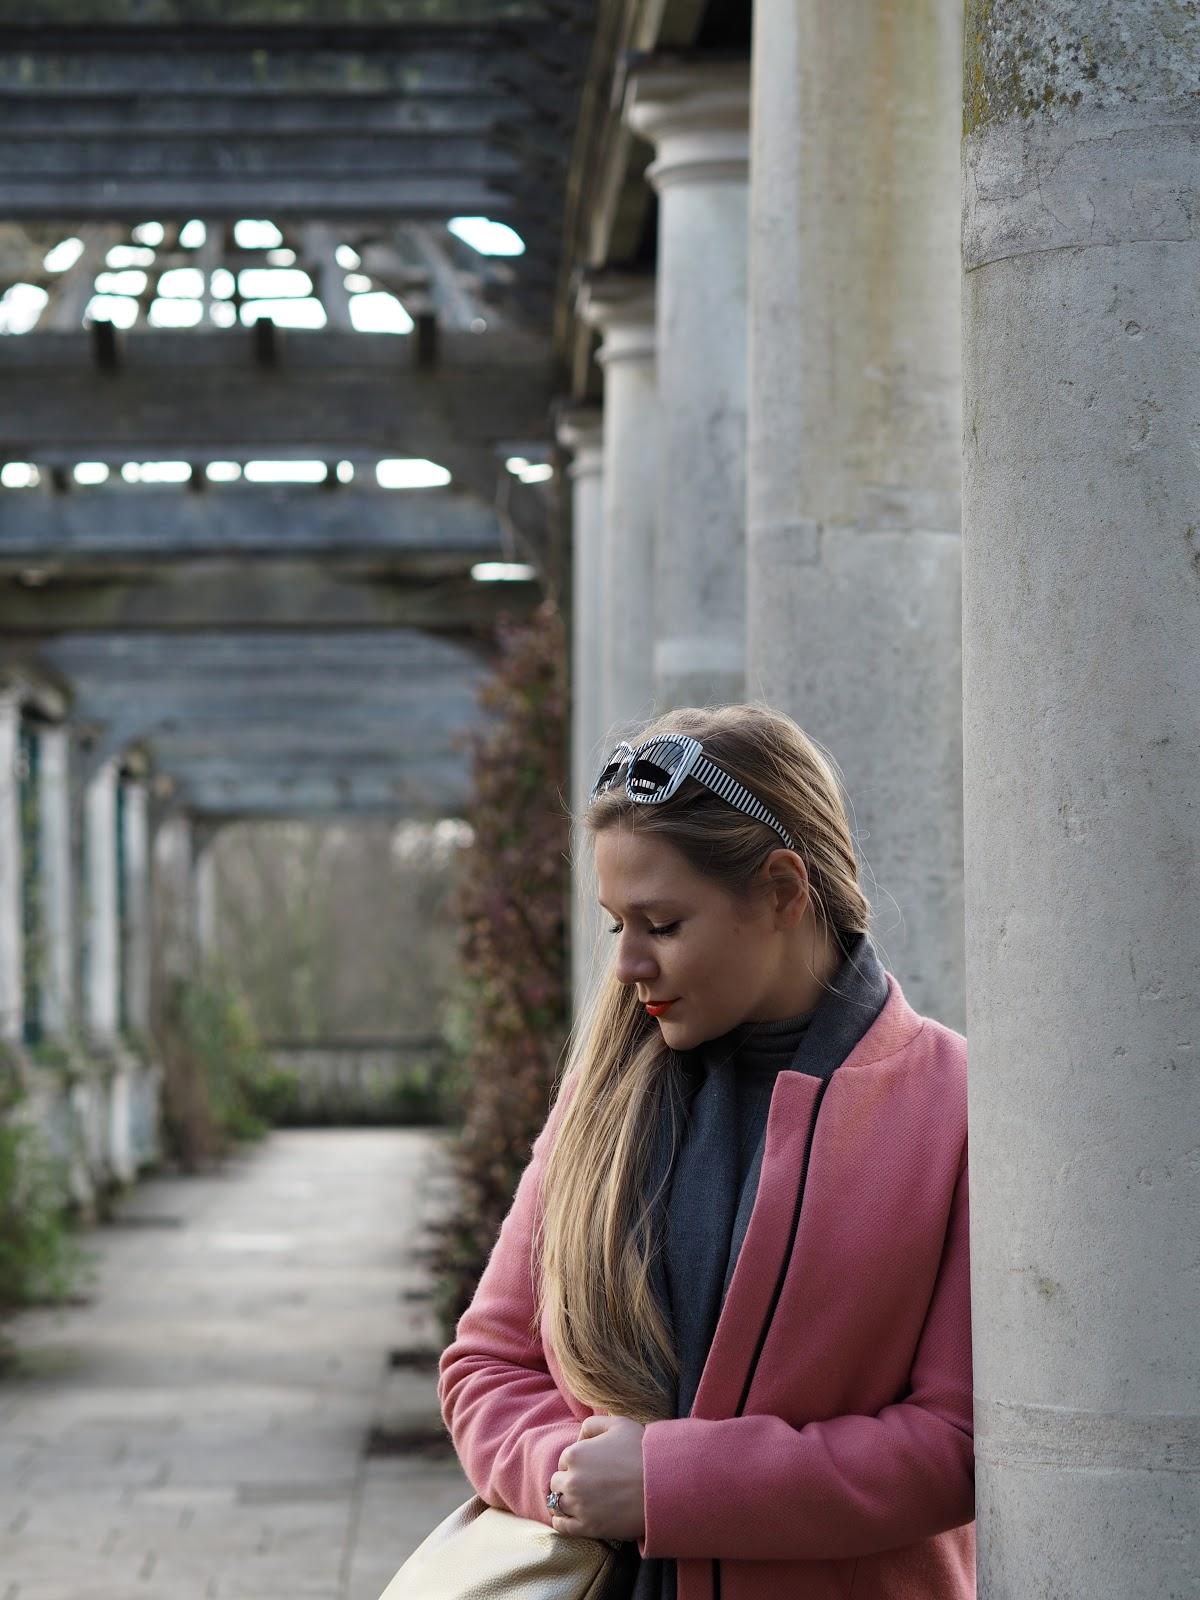 Blonde girl wearing pink coat leaning against pillar